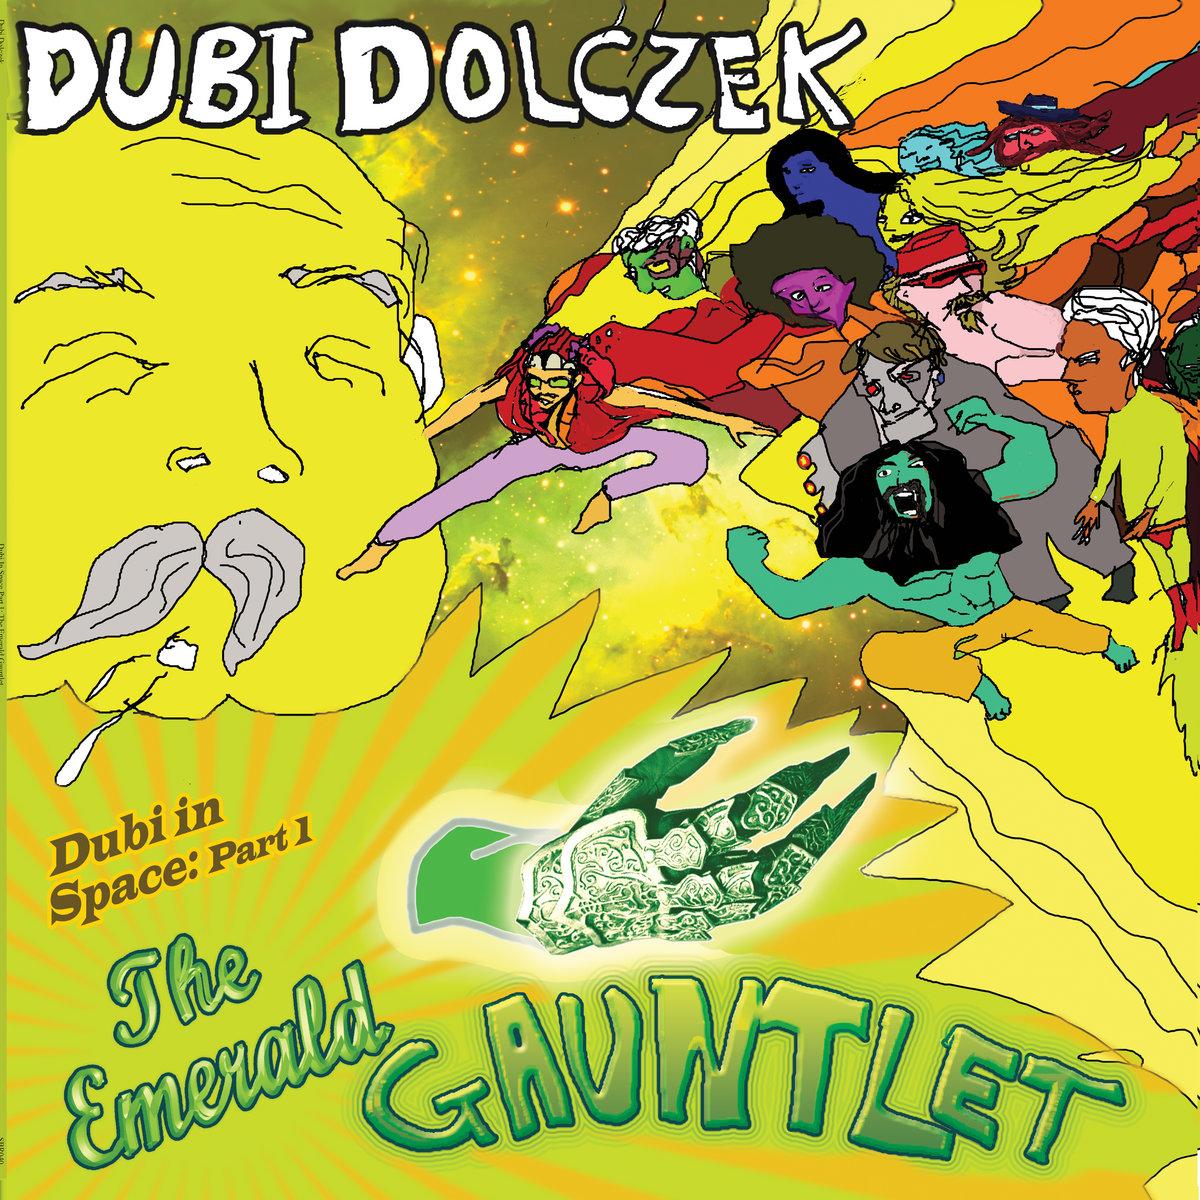 dubi in space part 1 the emerald gauntlet stolen body records